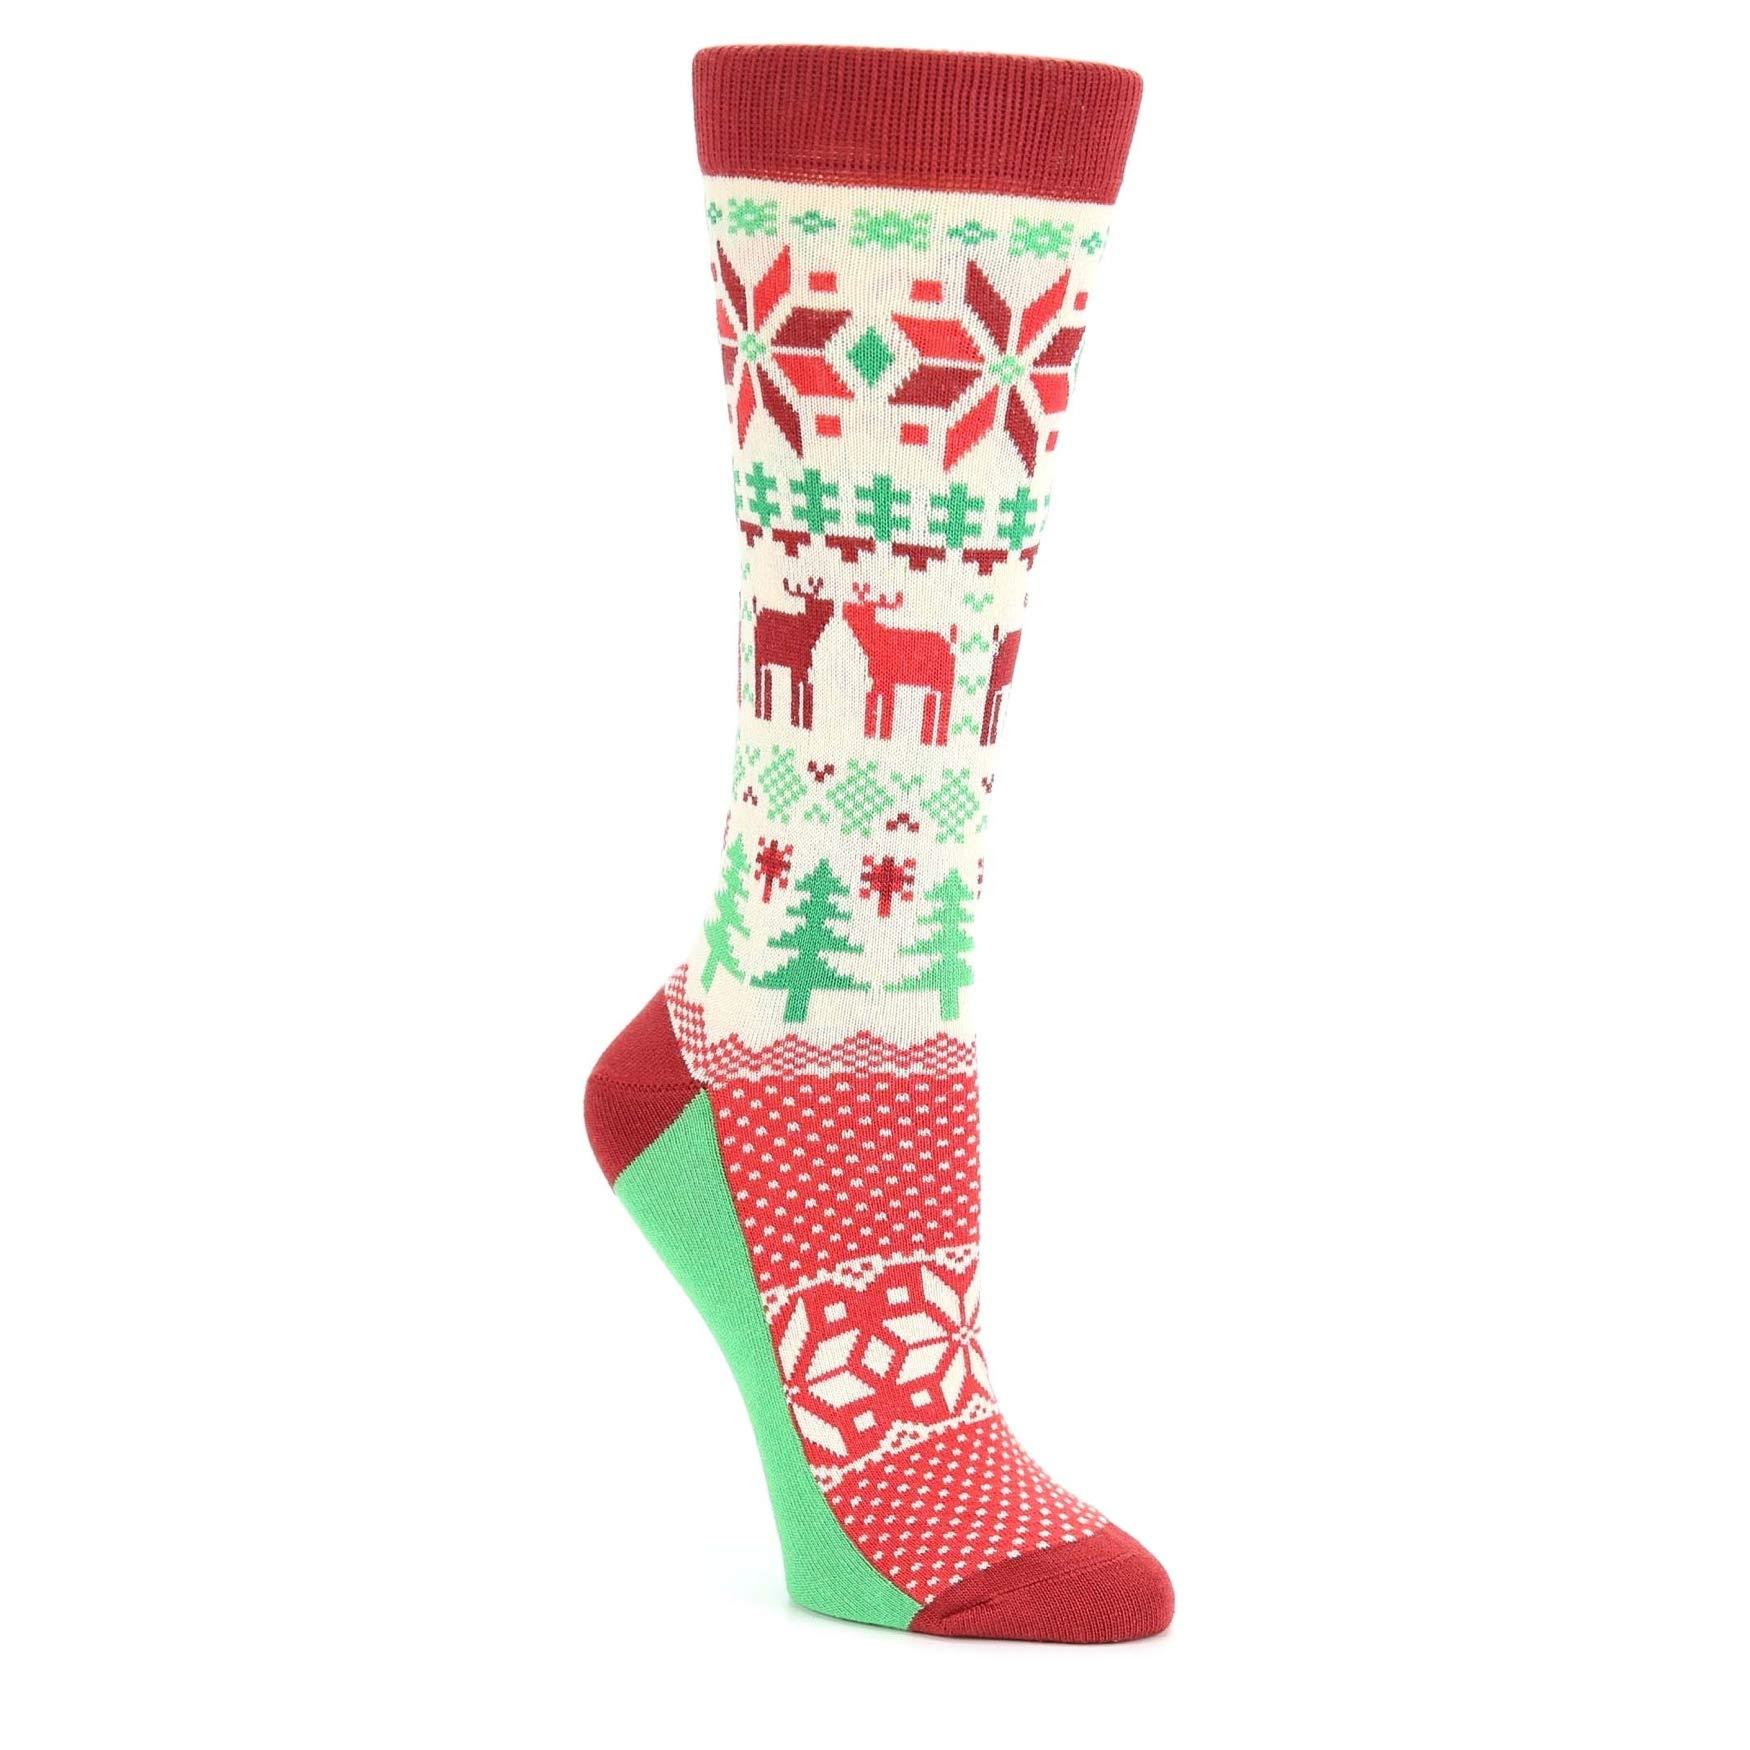 Red Green Fair Isle Christmas Women's Dress Socks - Statement Sockwear